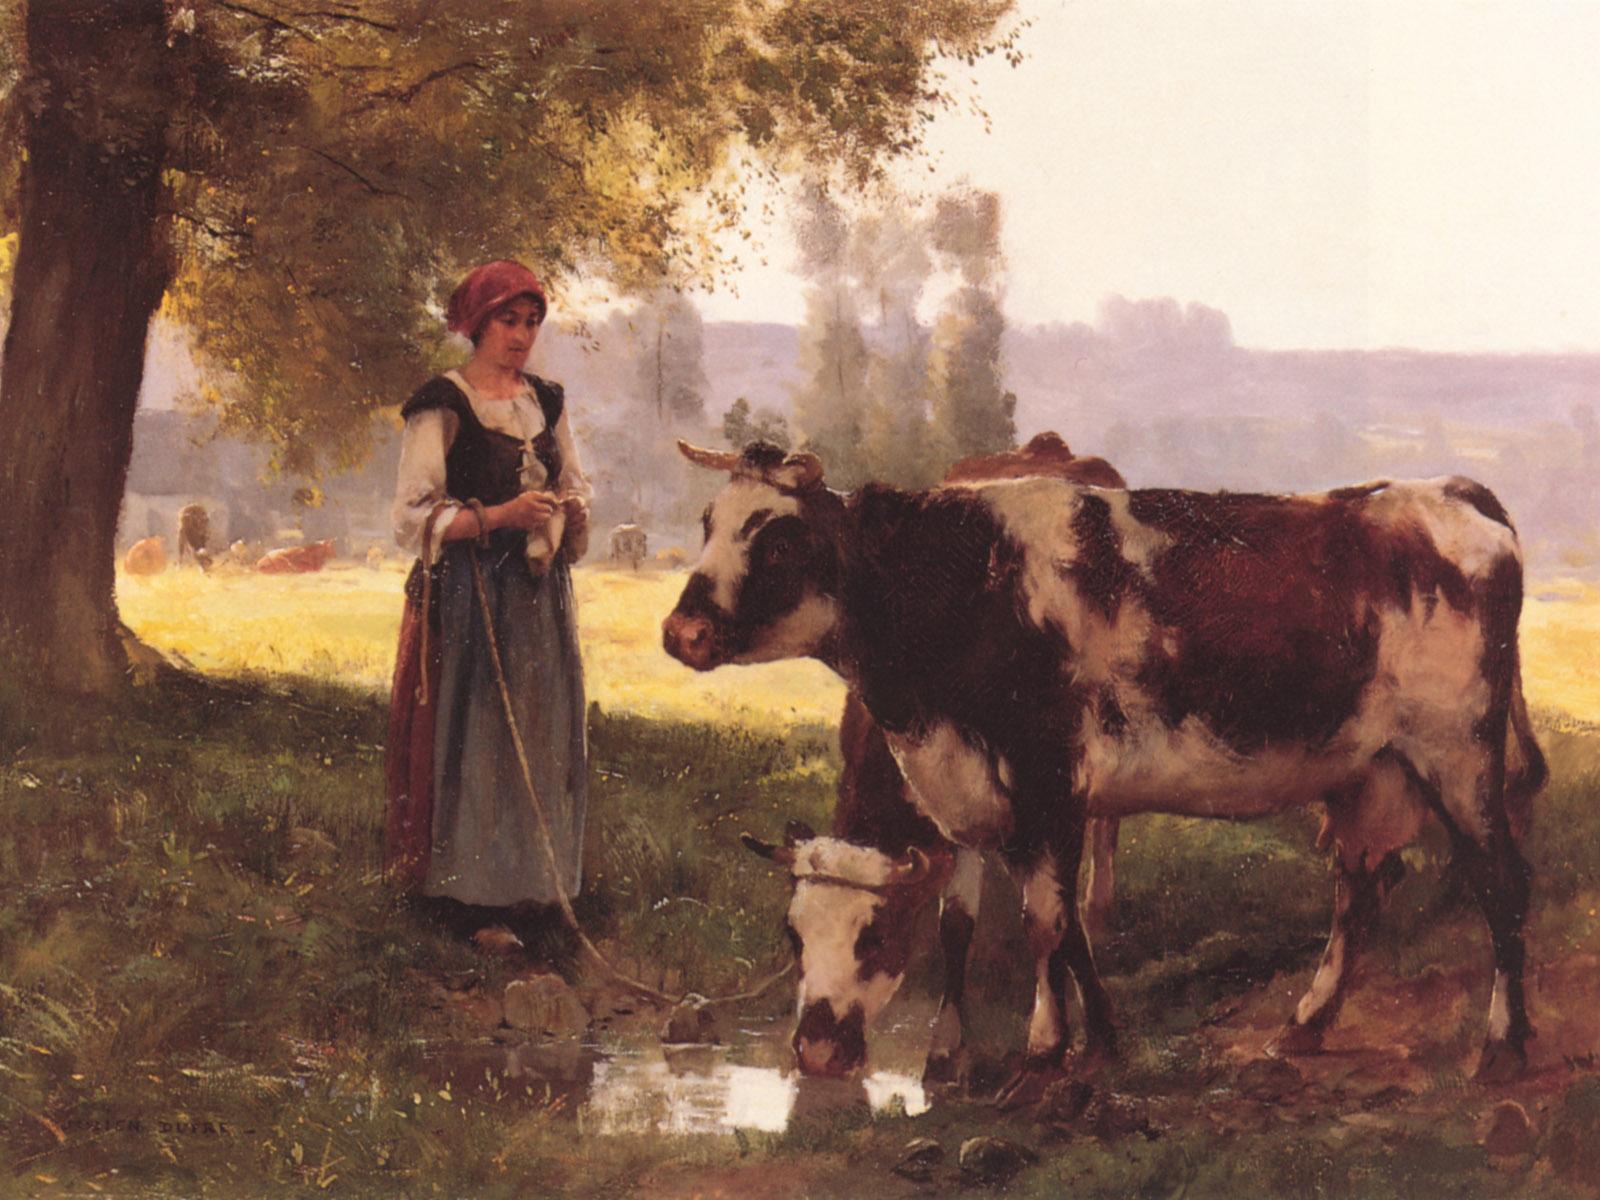 Fine Art Painting Art Prints Buy a Poster 1600x1200